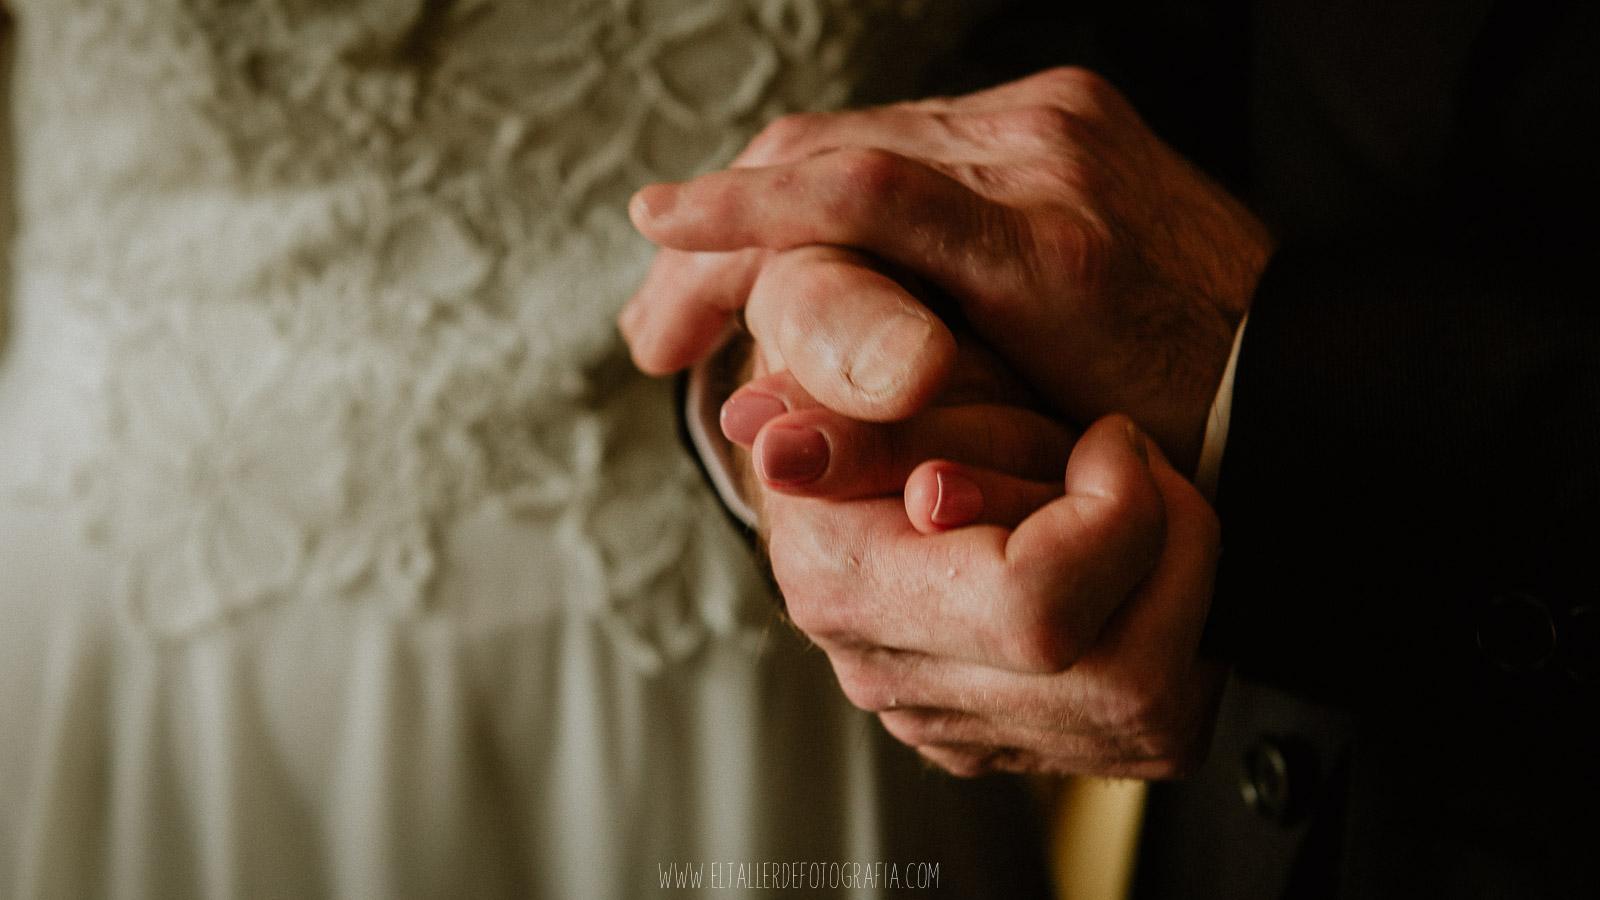 Mano de padre apretando con emocion la mano de la novia